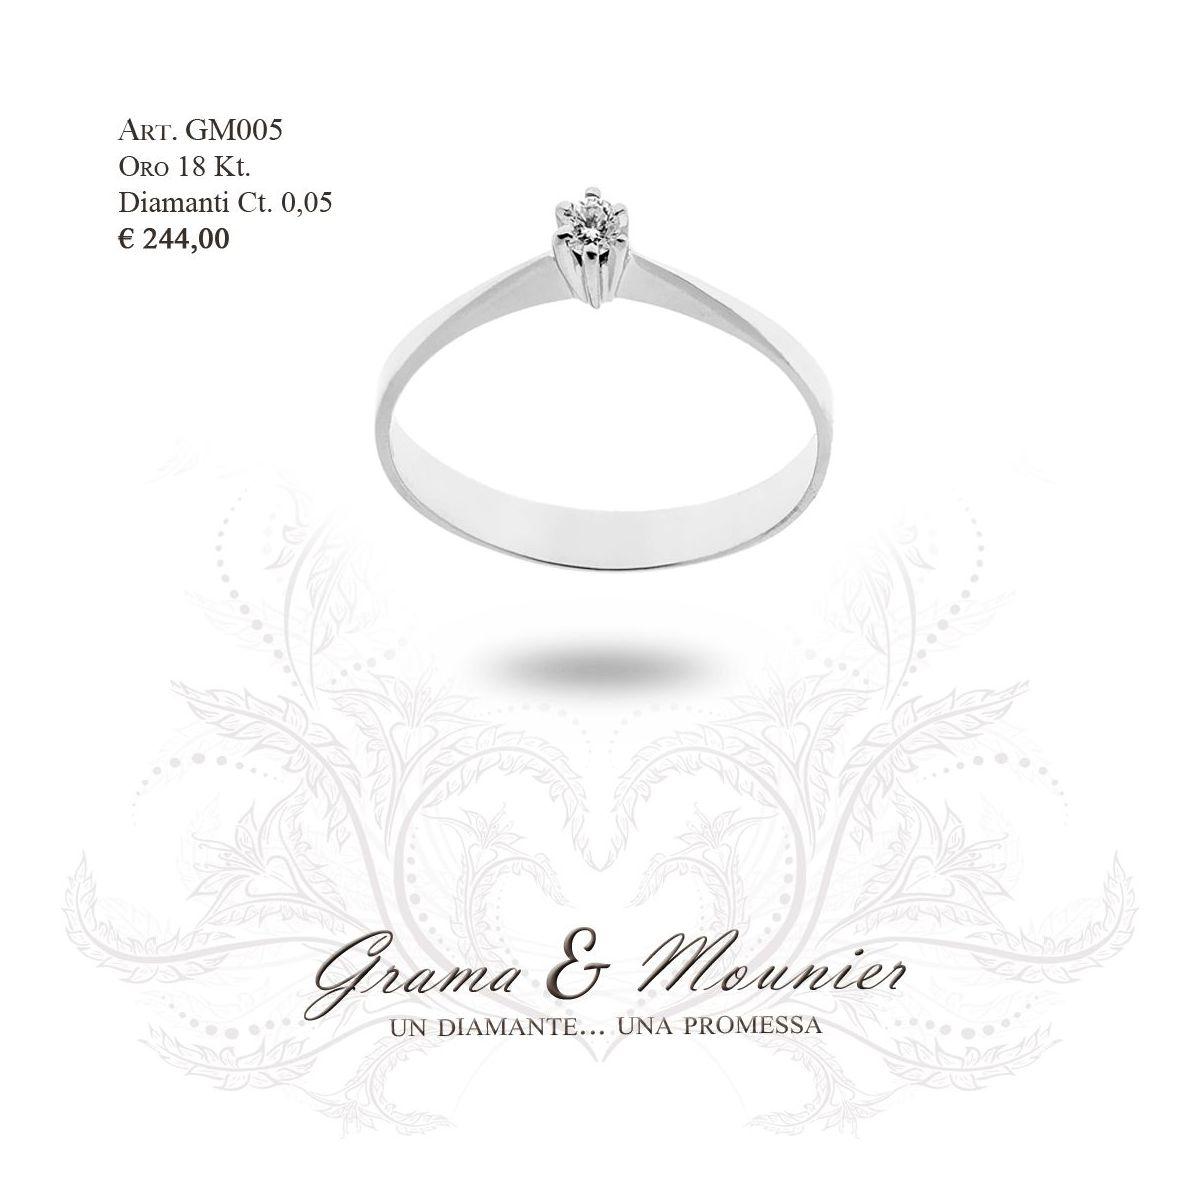 Anello in oro 18Kt Grama&Mounier Art.GM005